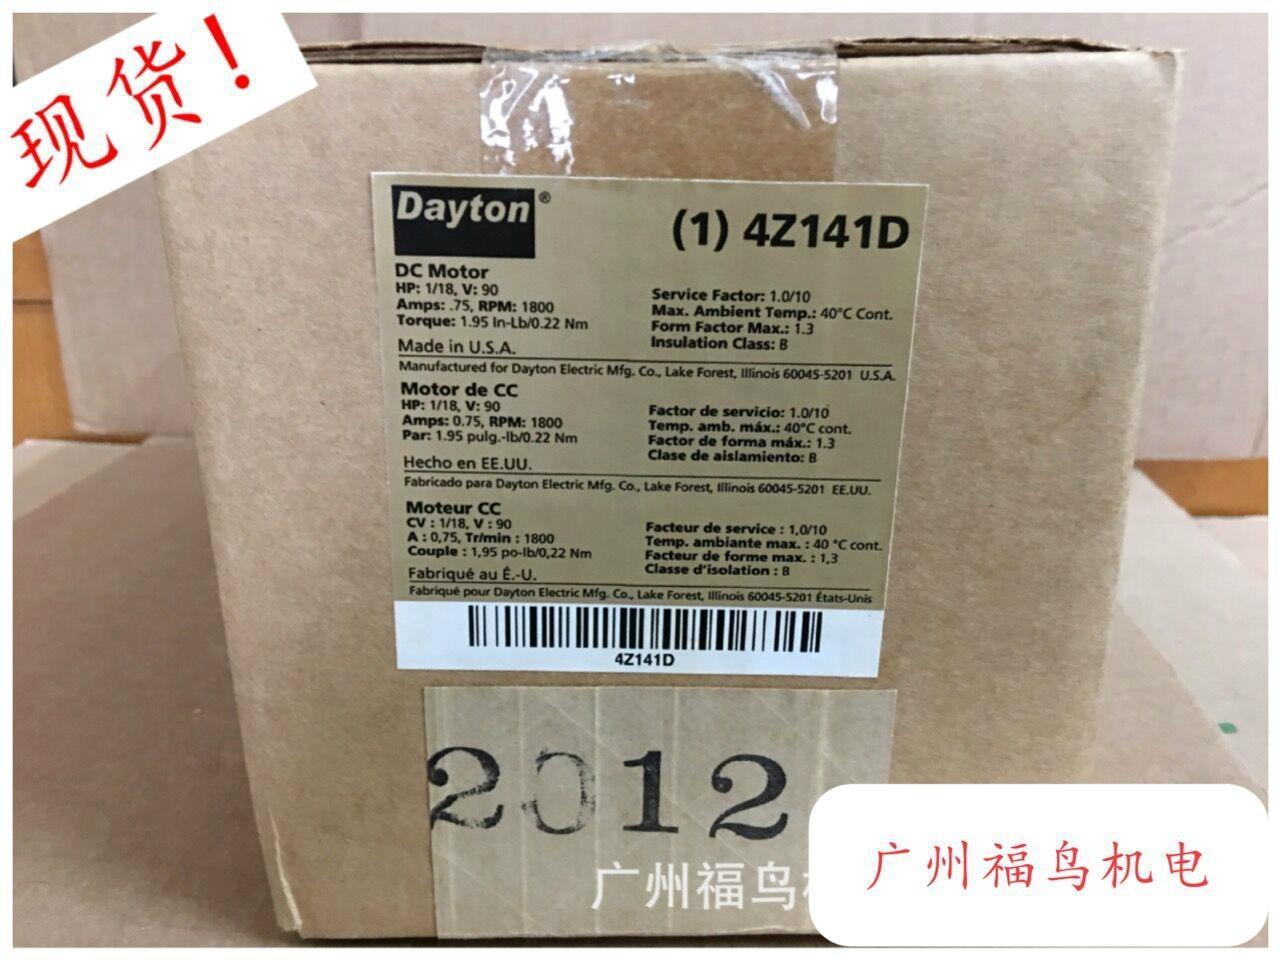 DAYTON電機, 馬達, 現貨型號: 4Z141D